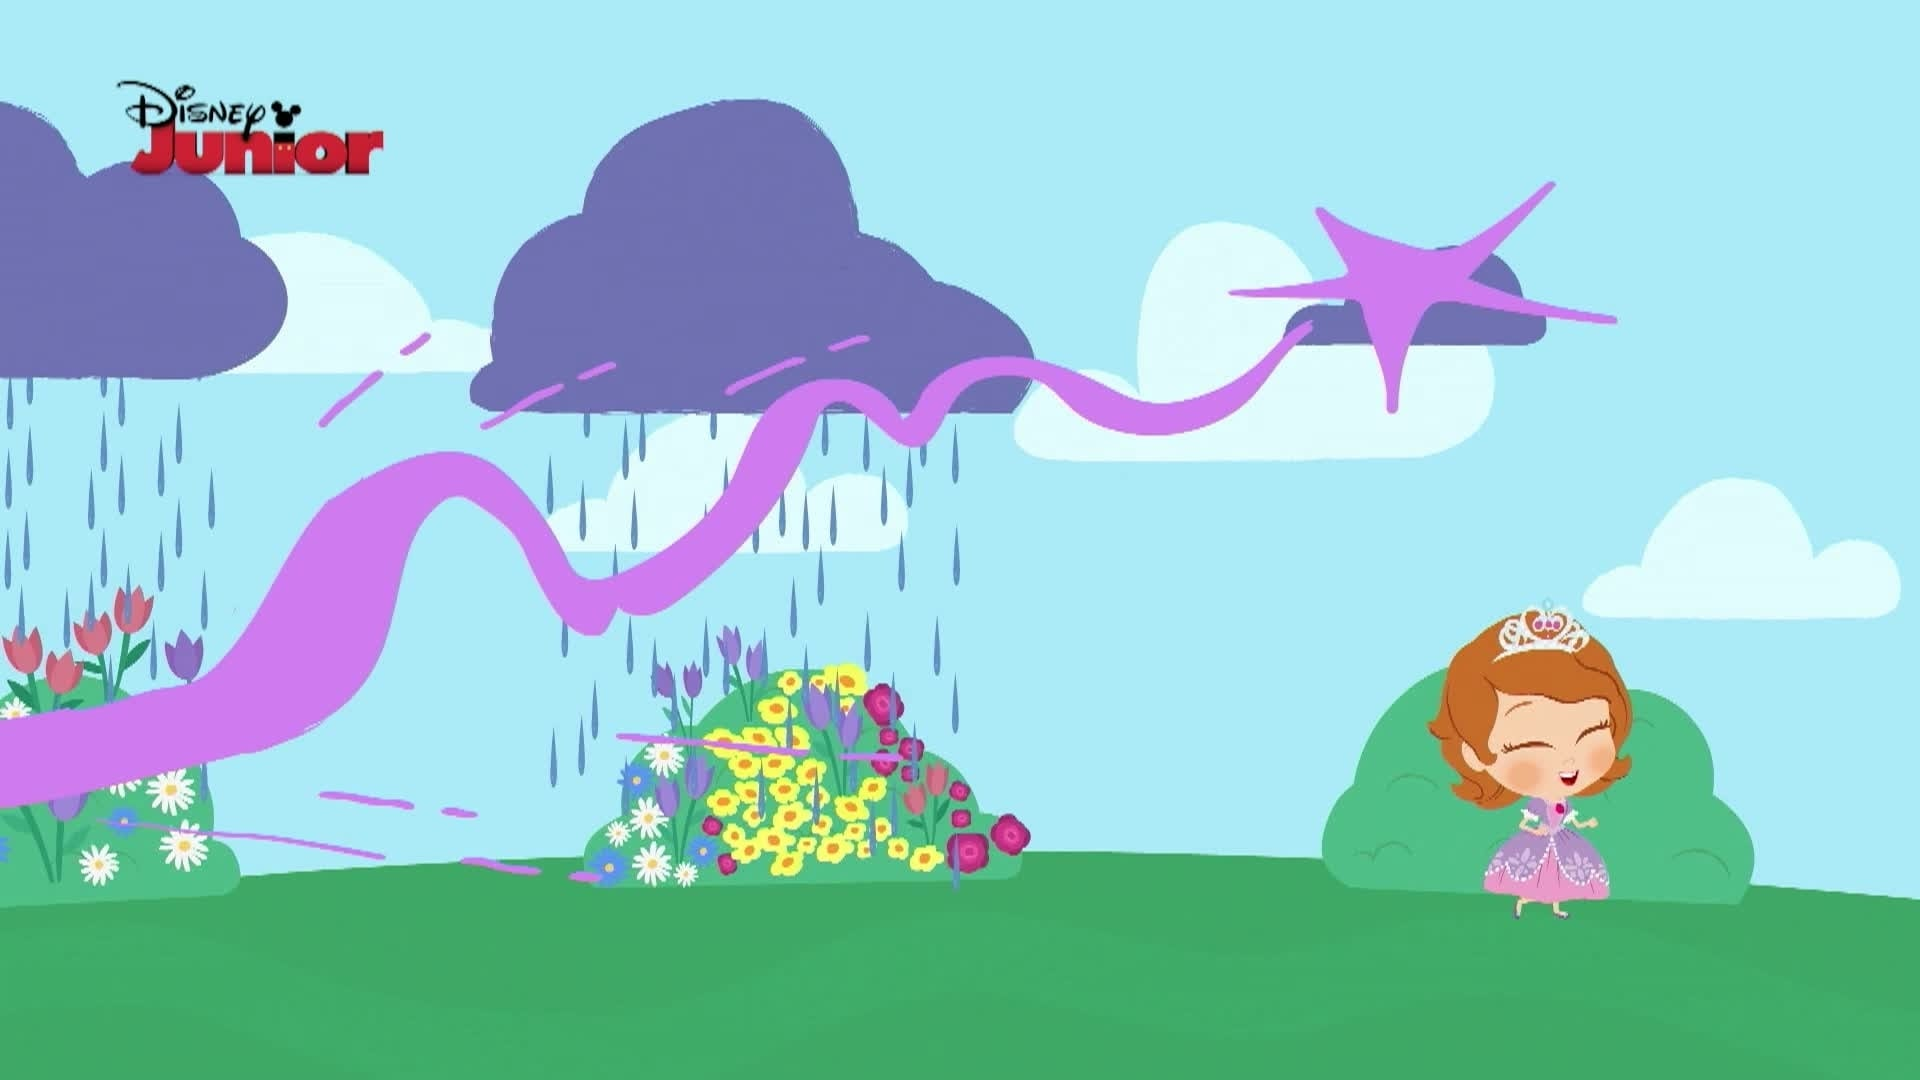 Canções Infantis - Chuva, Chuva, Vai-te Embora